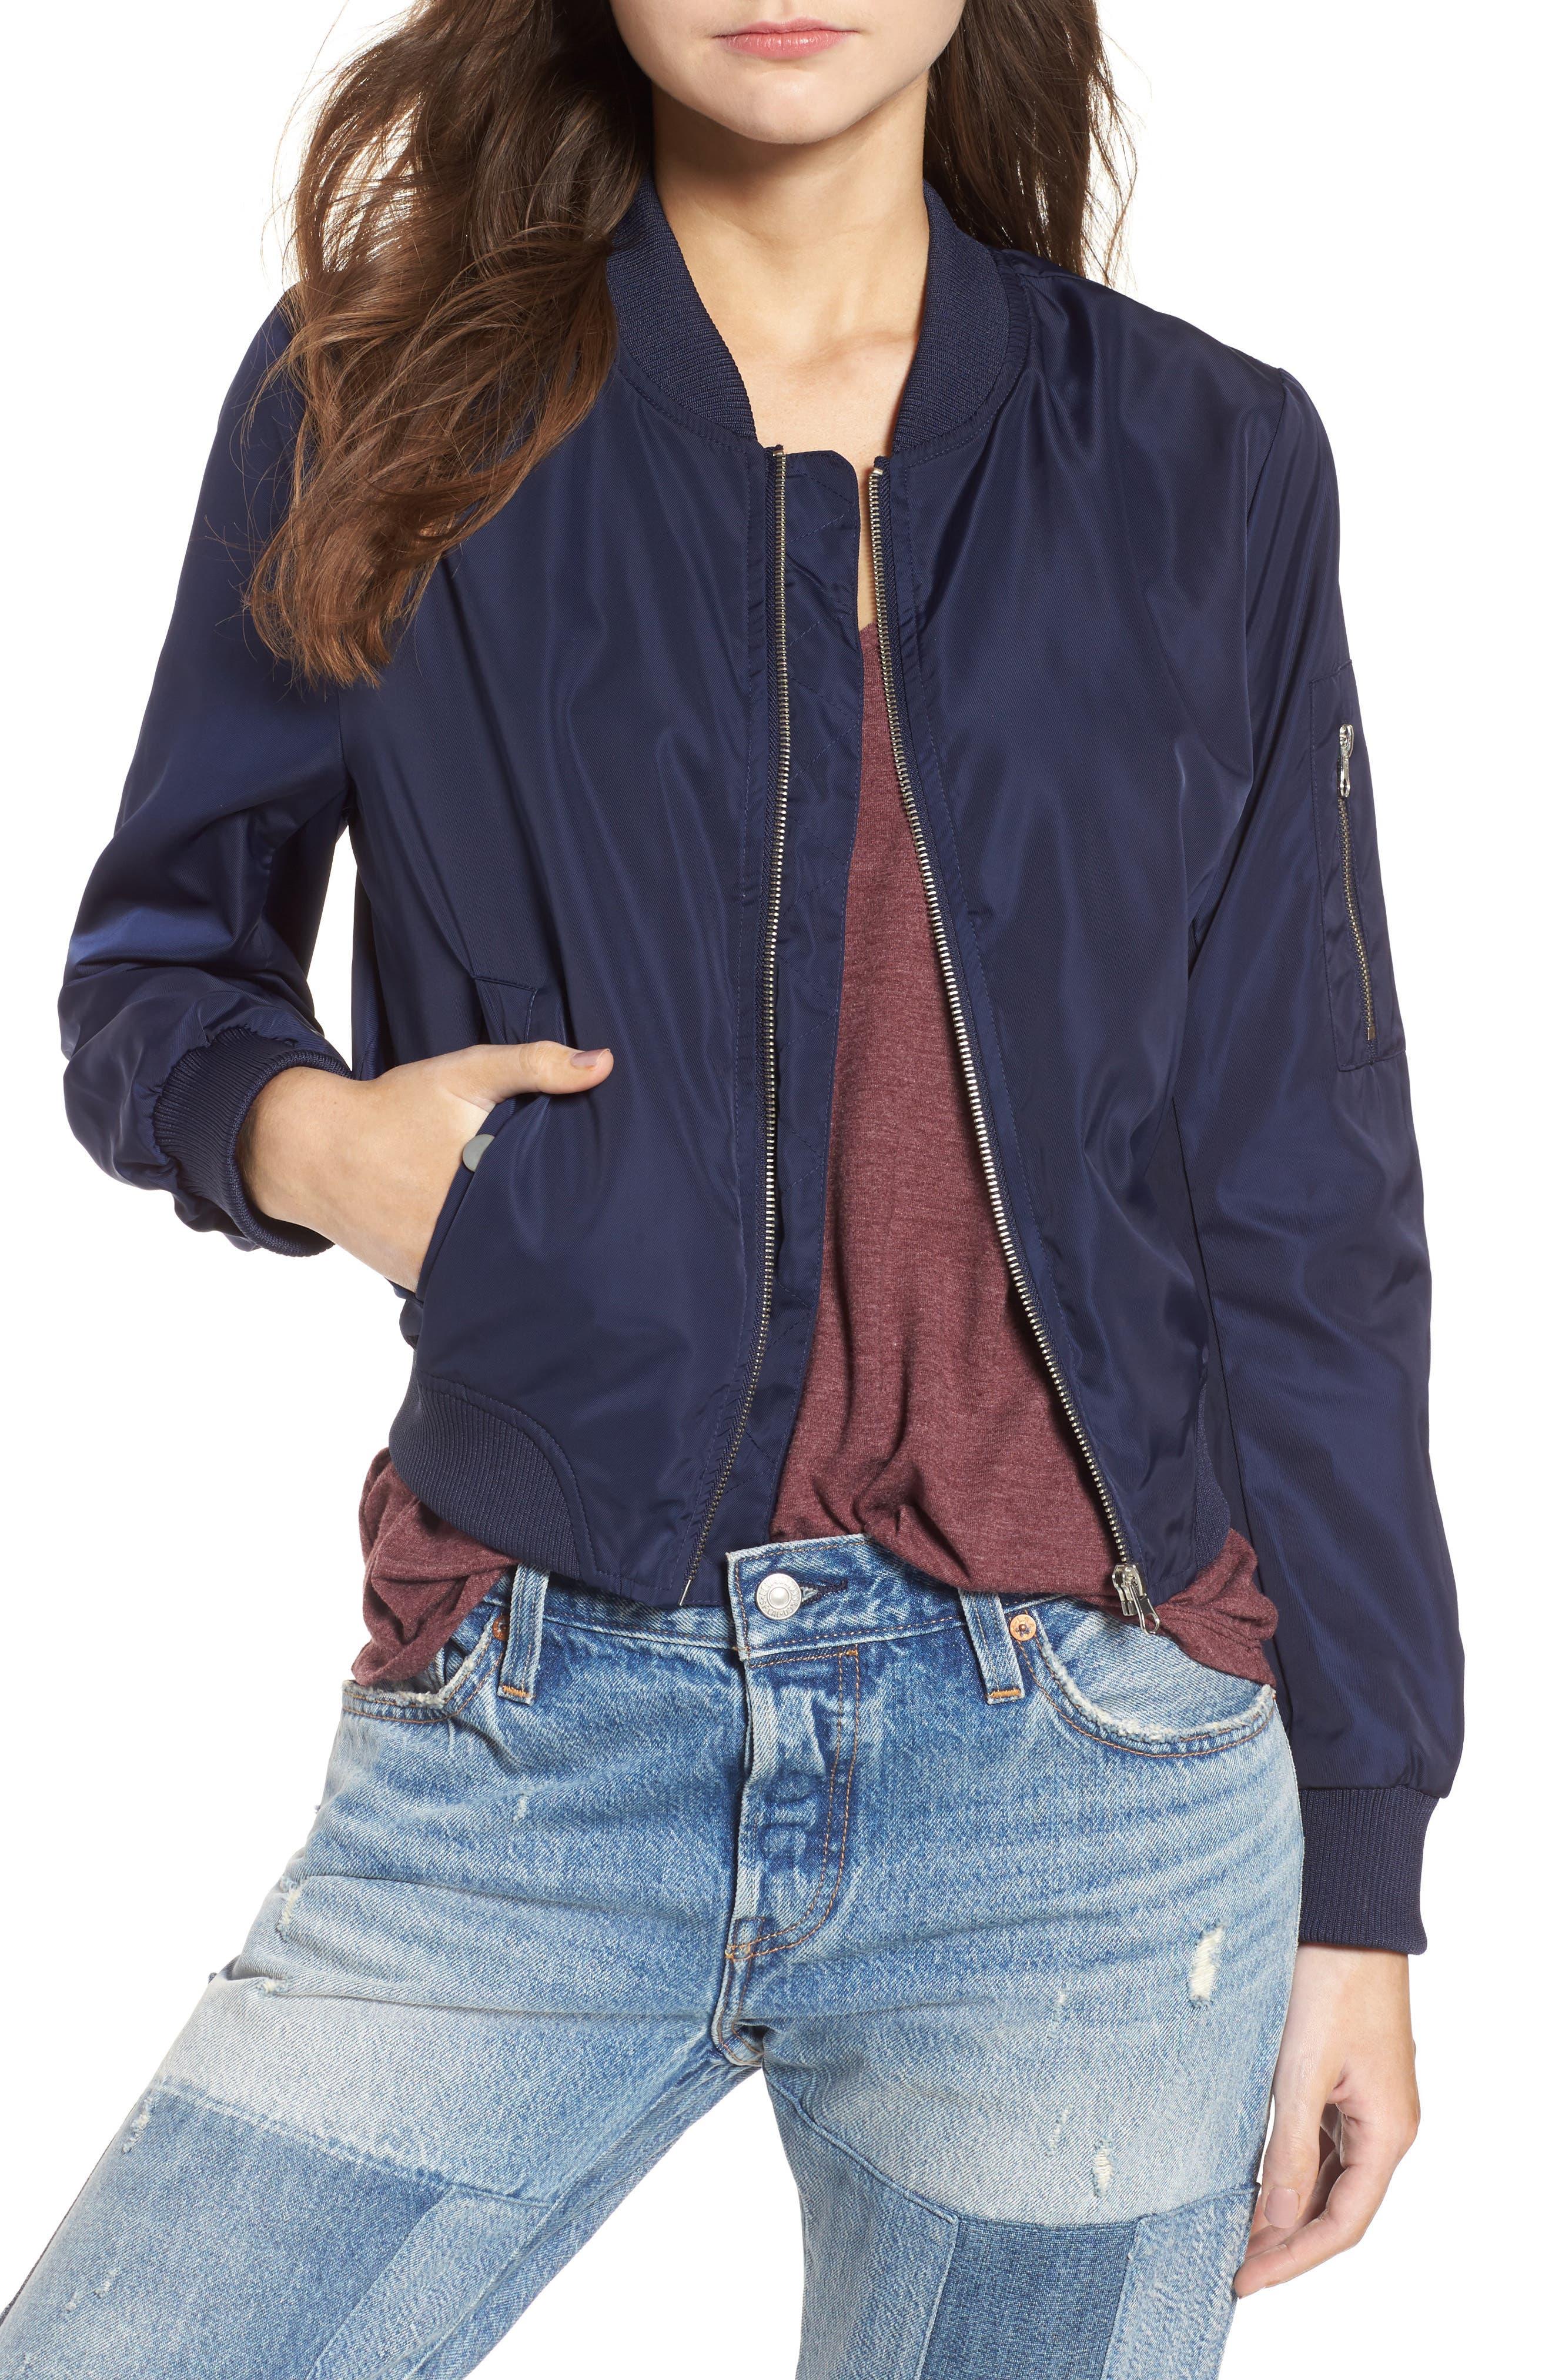 BB Dakota Cayleigh Bomber Jacket